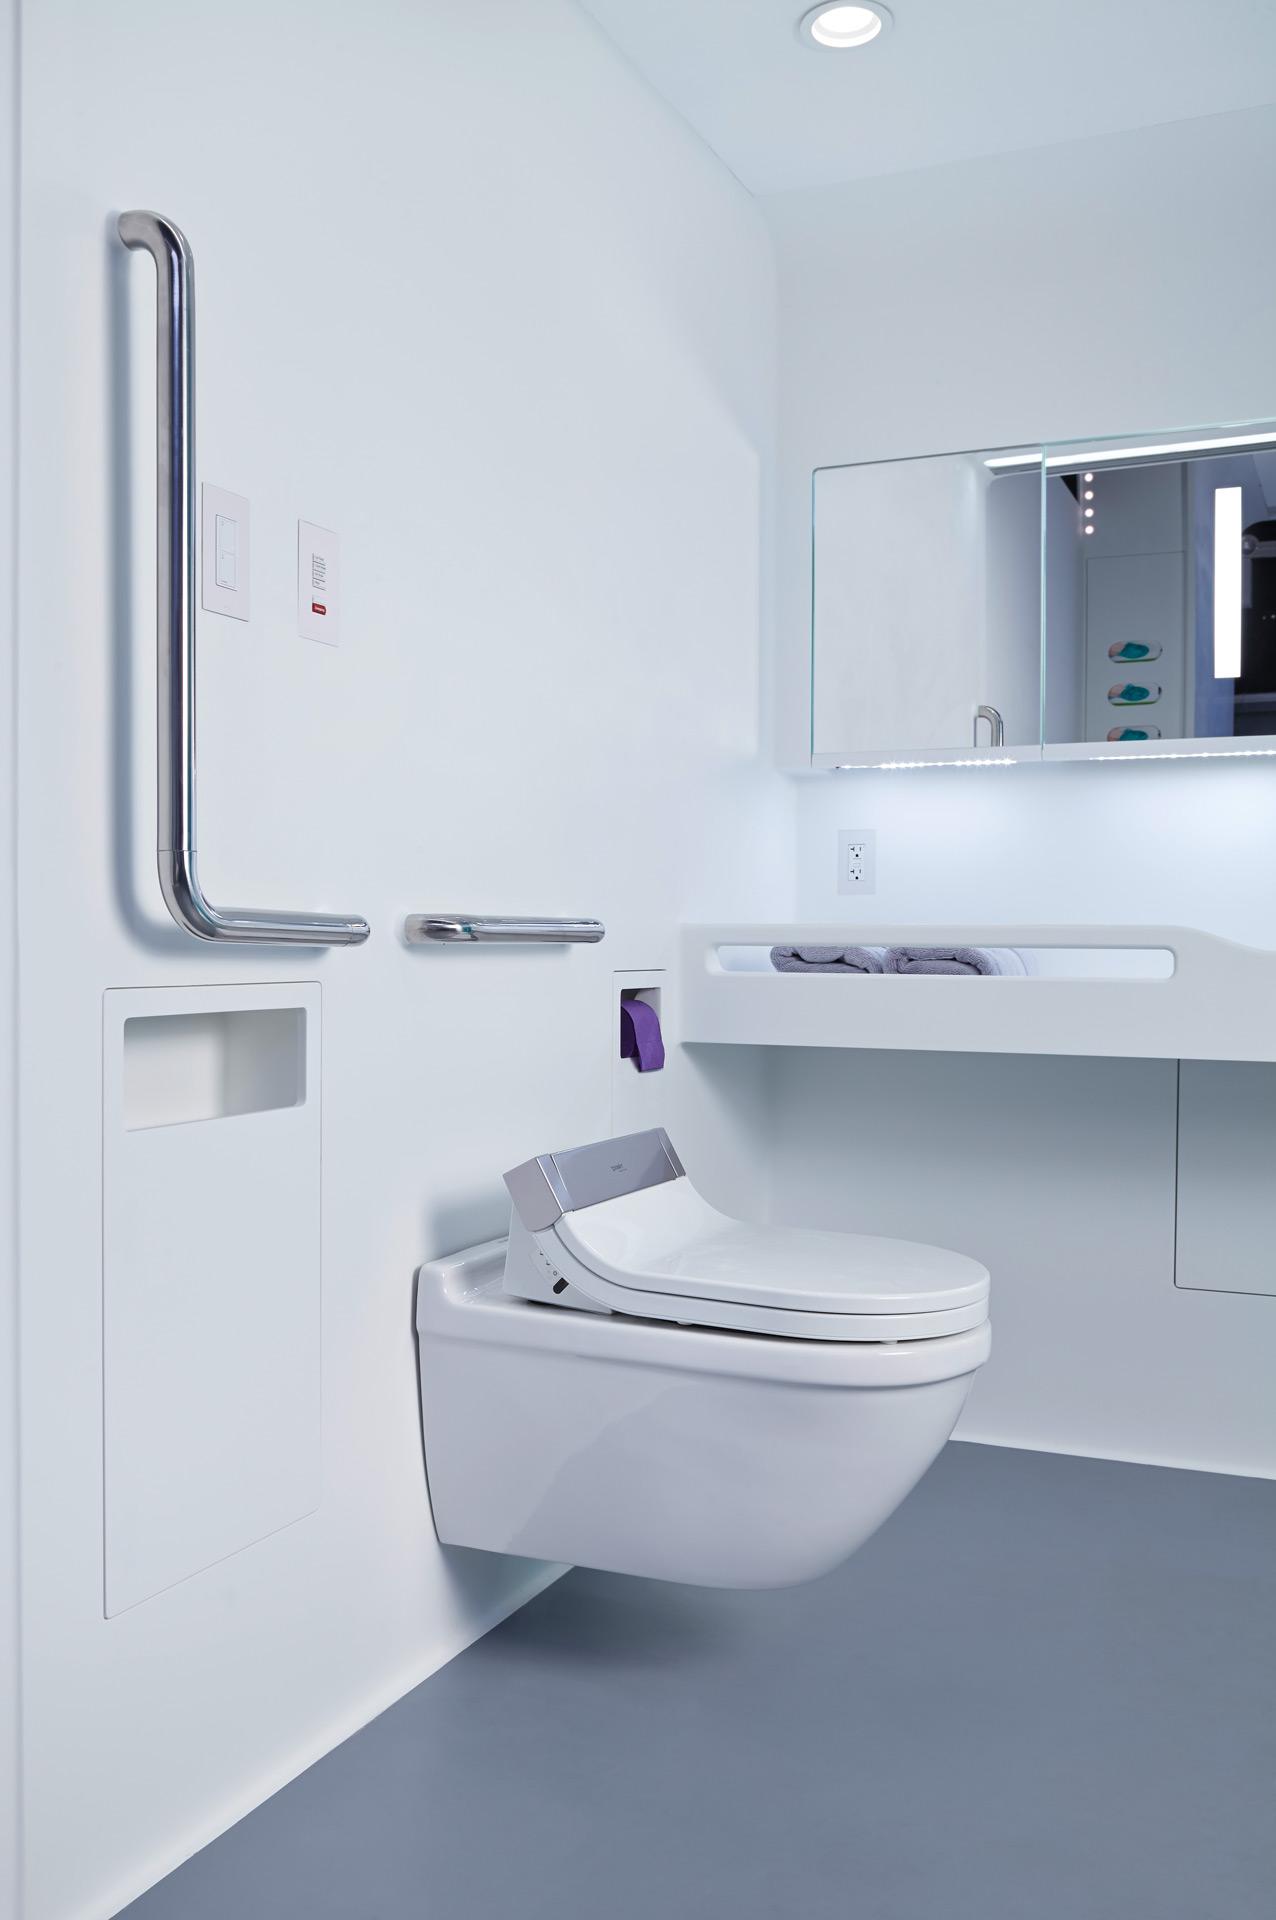 DBI_PR2020_OpenBathroom_Toilet_Photo